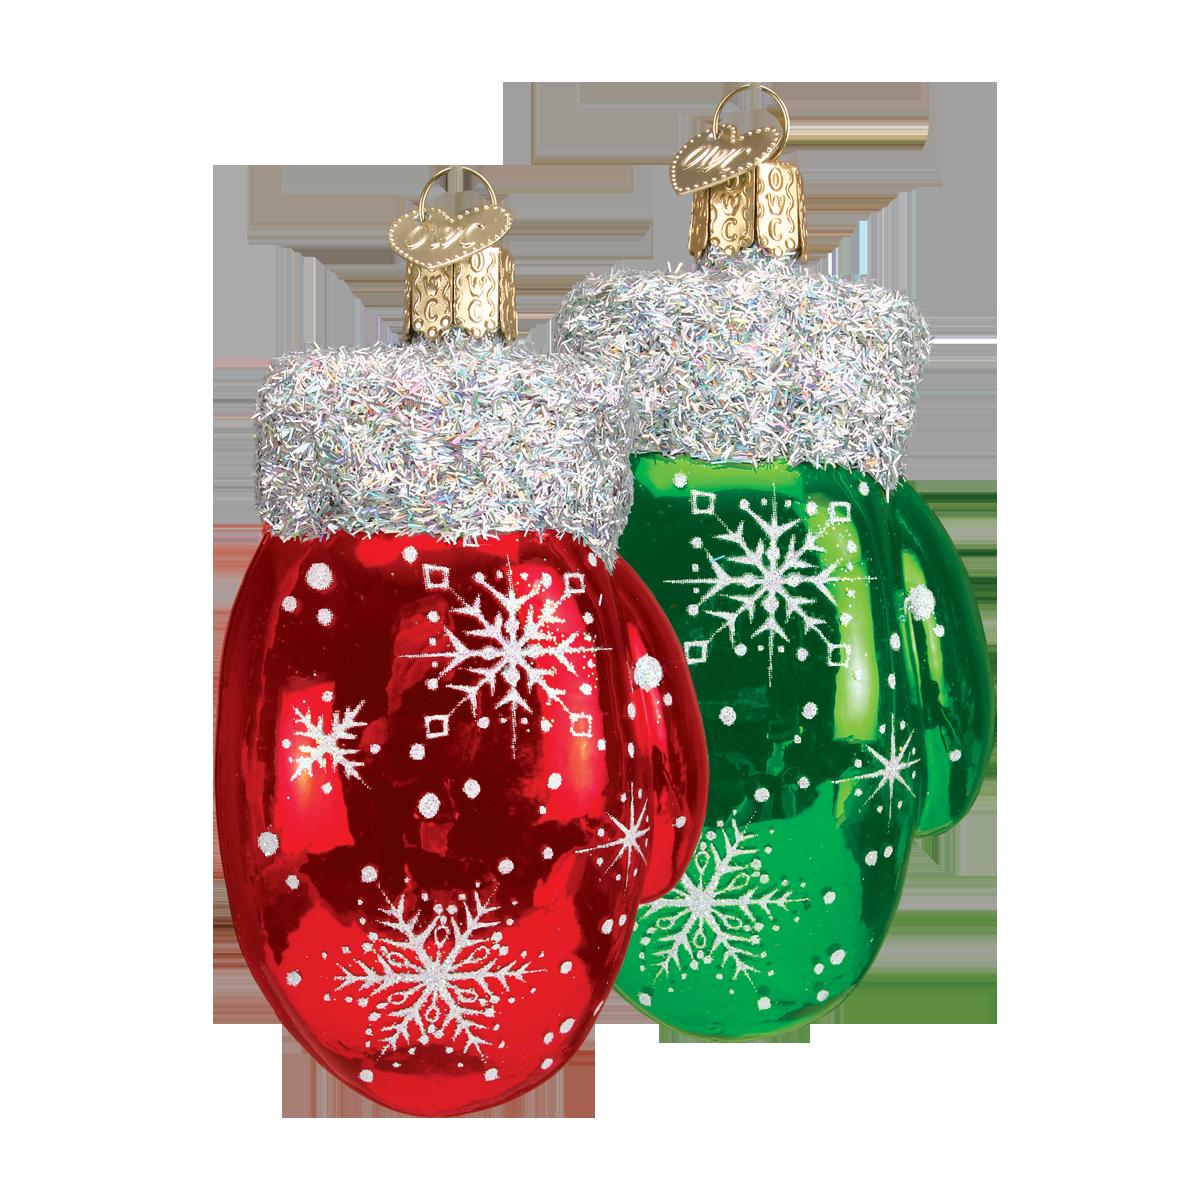 christmas ornament - Christmas Mittens